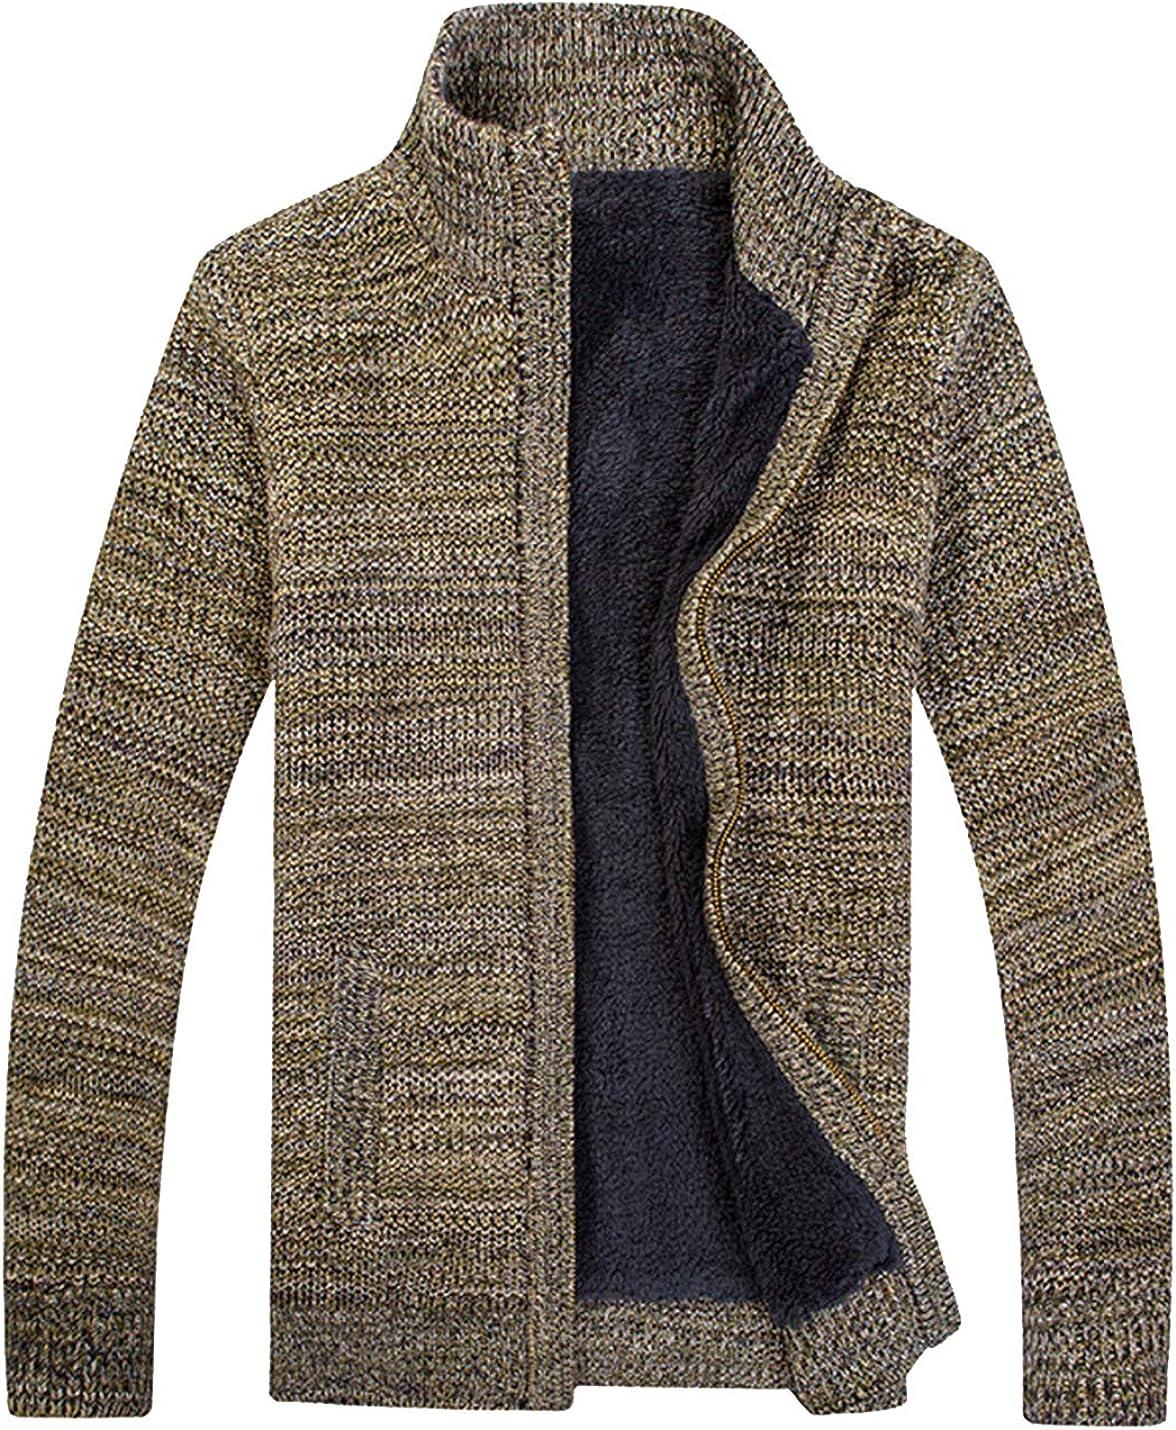 HaoMay Men's Winter Fleece Lined Full Zip Knitted Cardigan Sweater Jacket